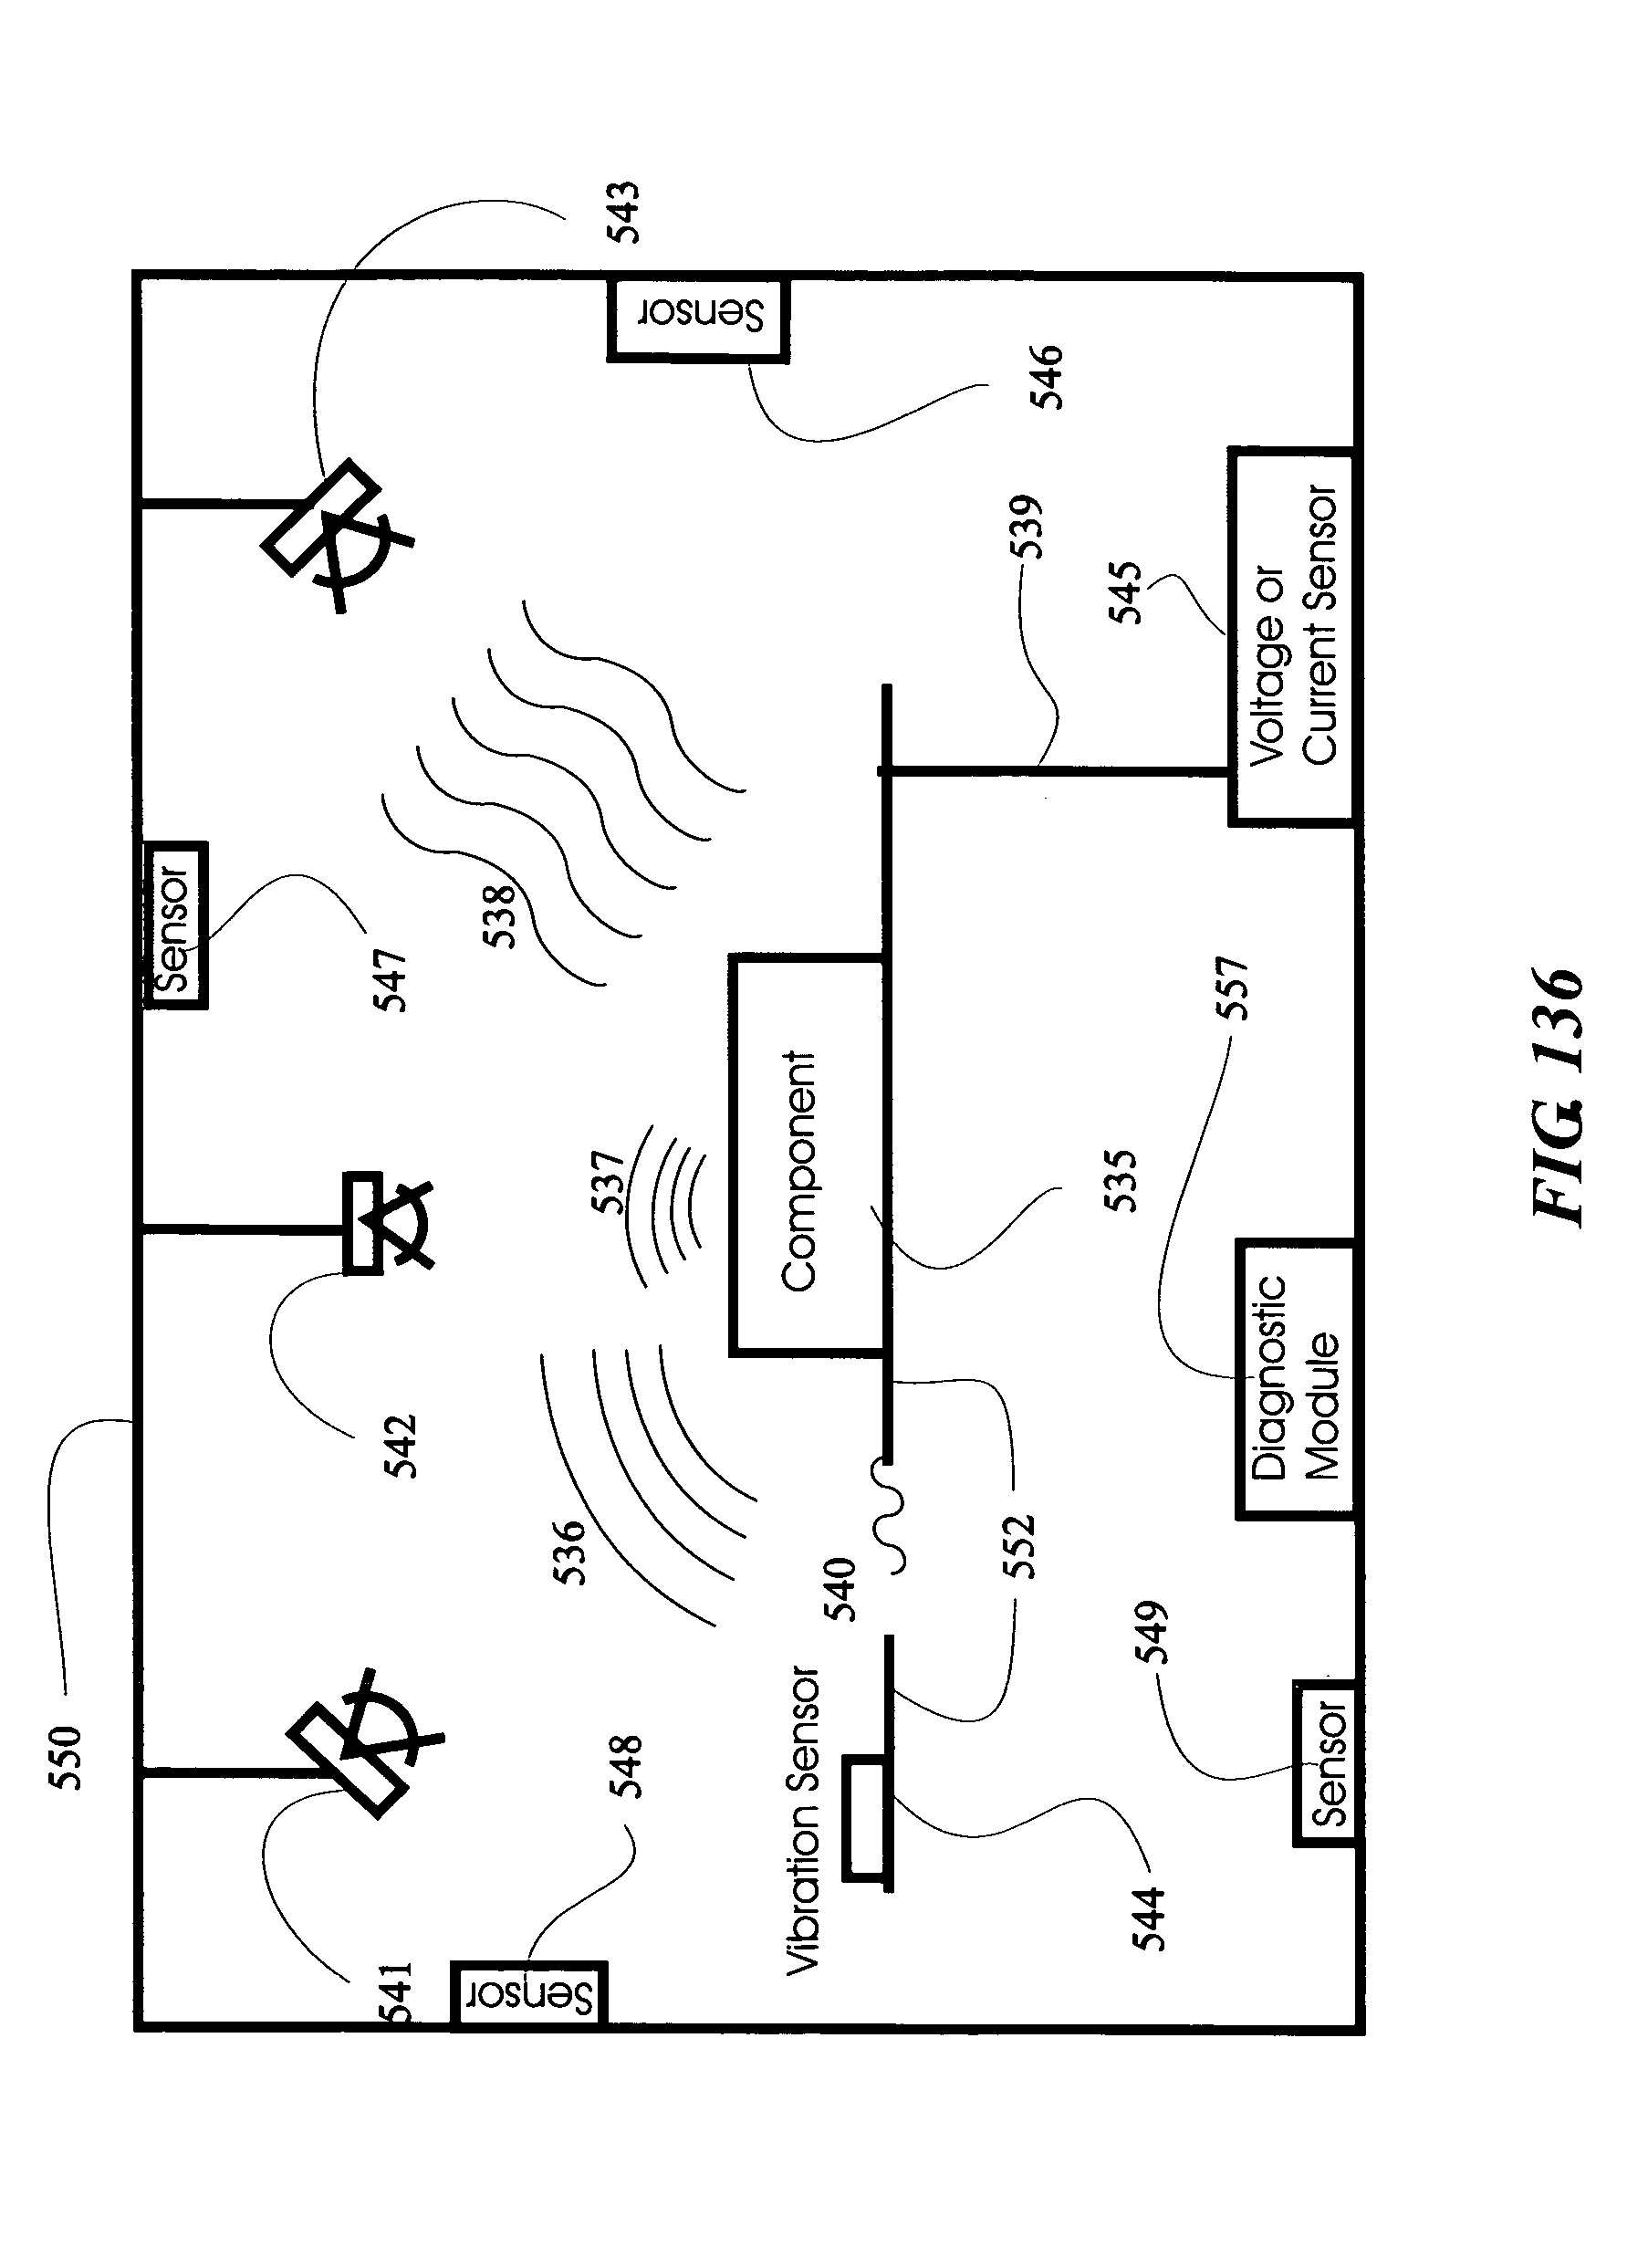 Patent Us 7164117 B2 Airbag Wiring Diagram 2009 Fusion Images